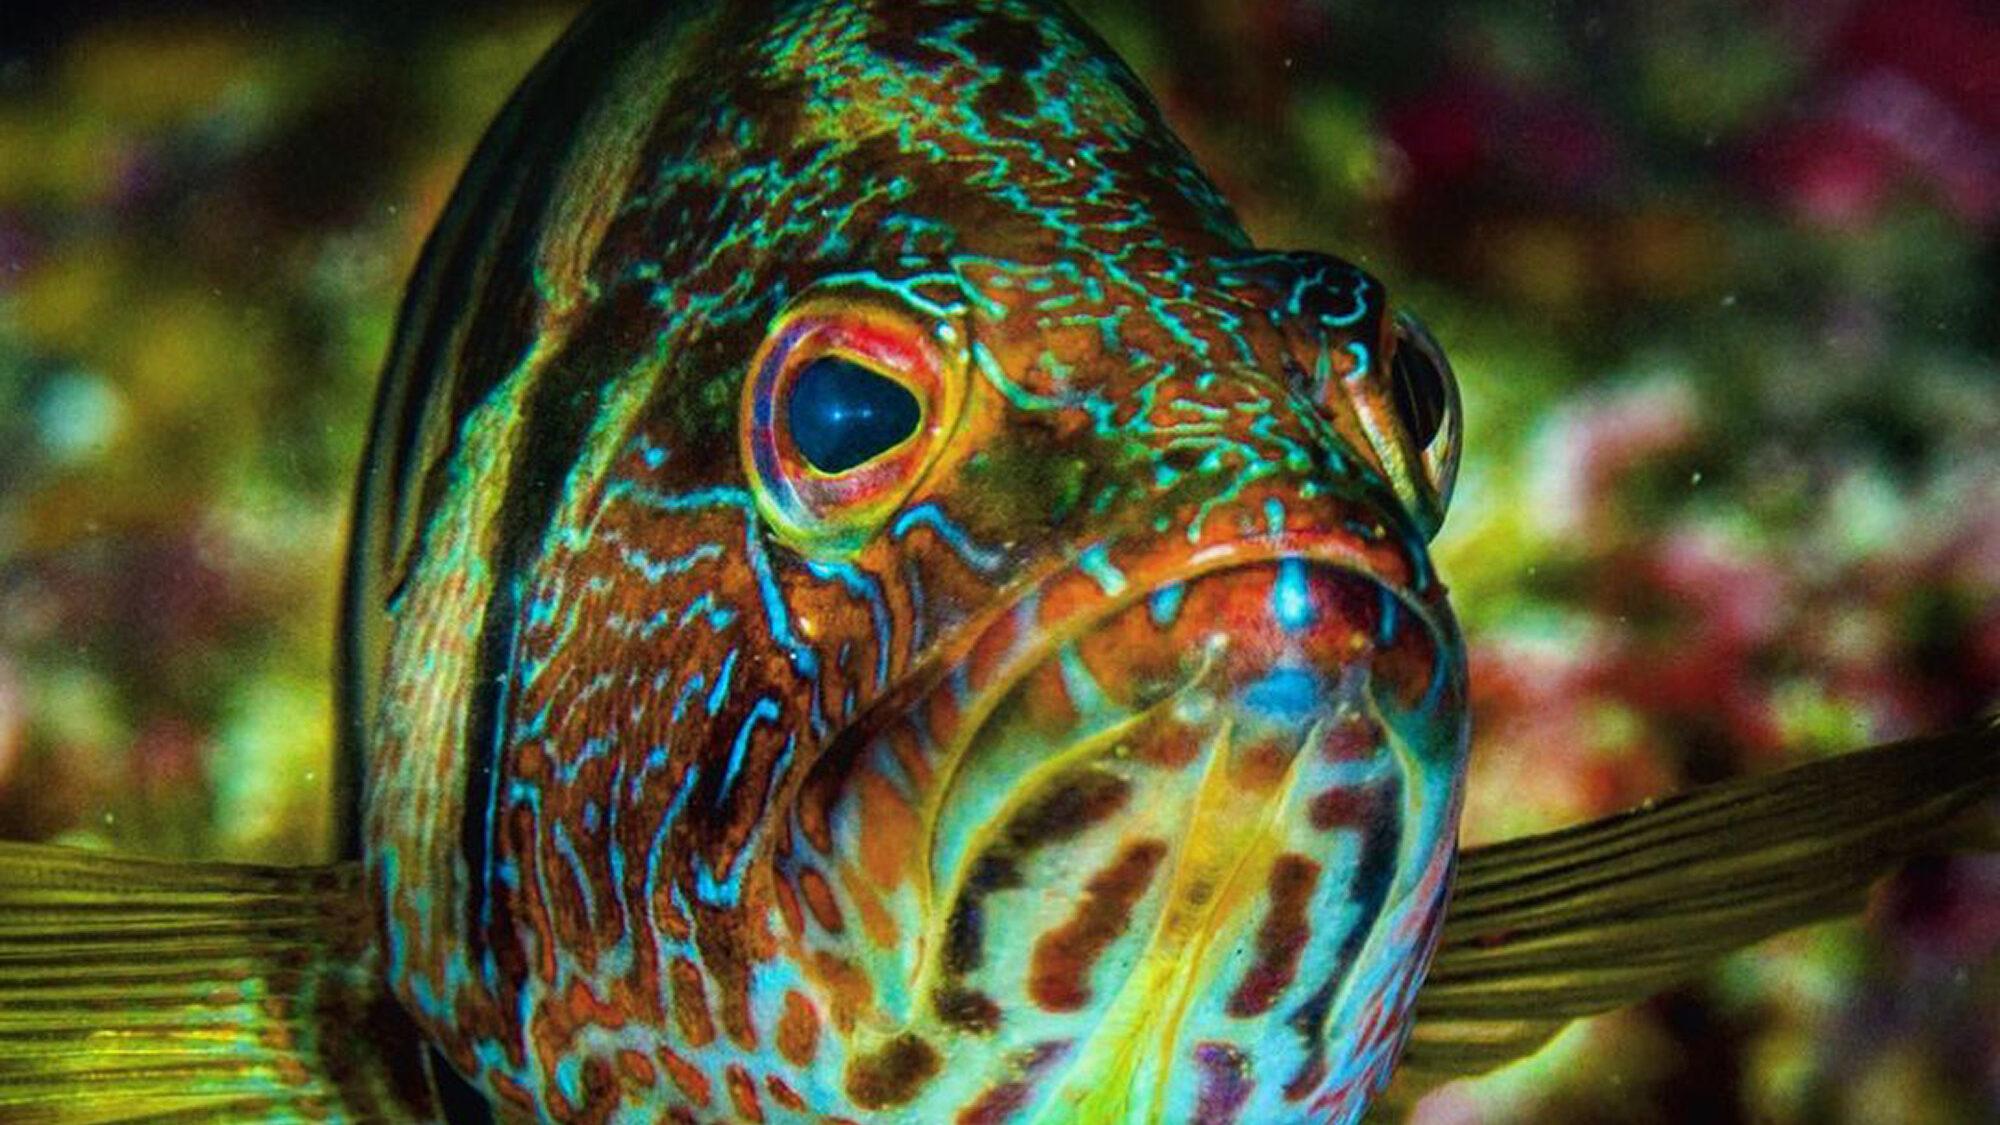 Seahorses, Demon Stingers and 'Grumpy' Fish: Photographer's Lens Captures Vanishing Ocean Habitats